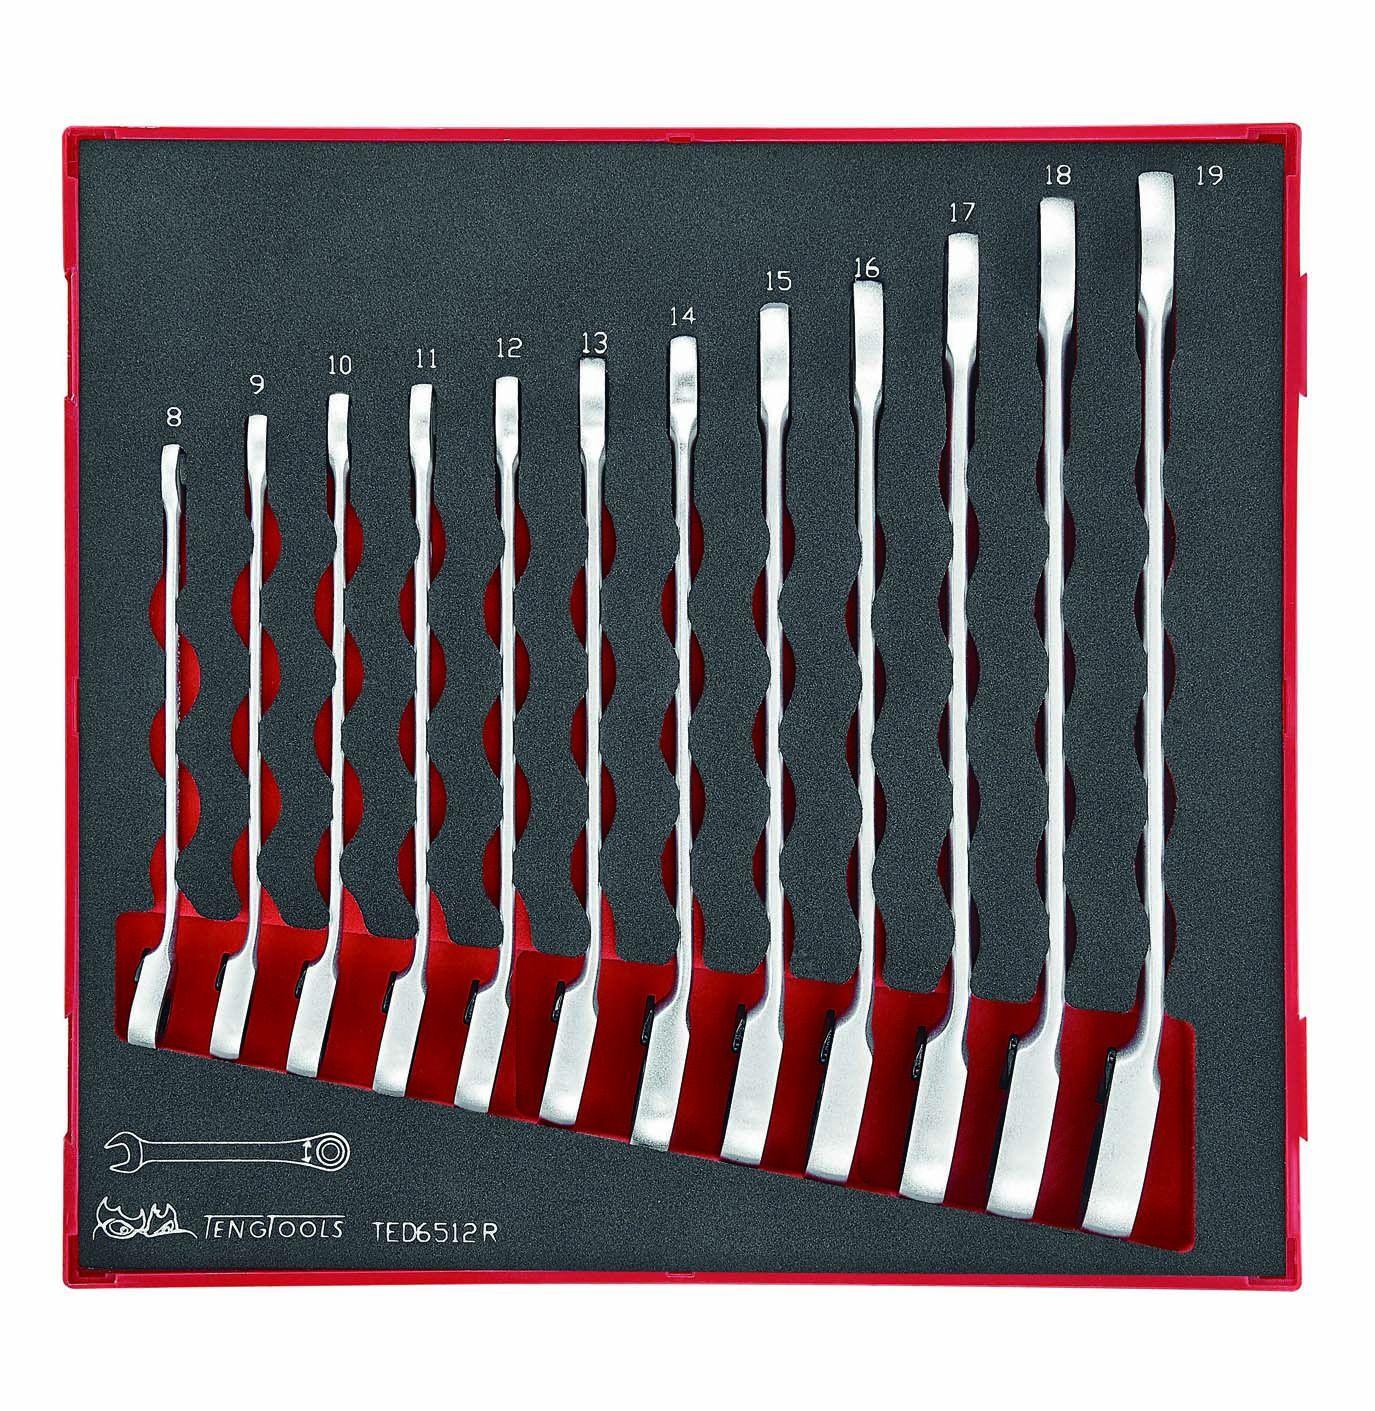 Teng Tools 12 Piece Ratchet Angled Spanner Set